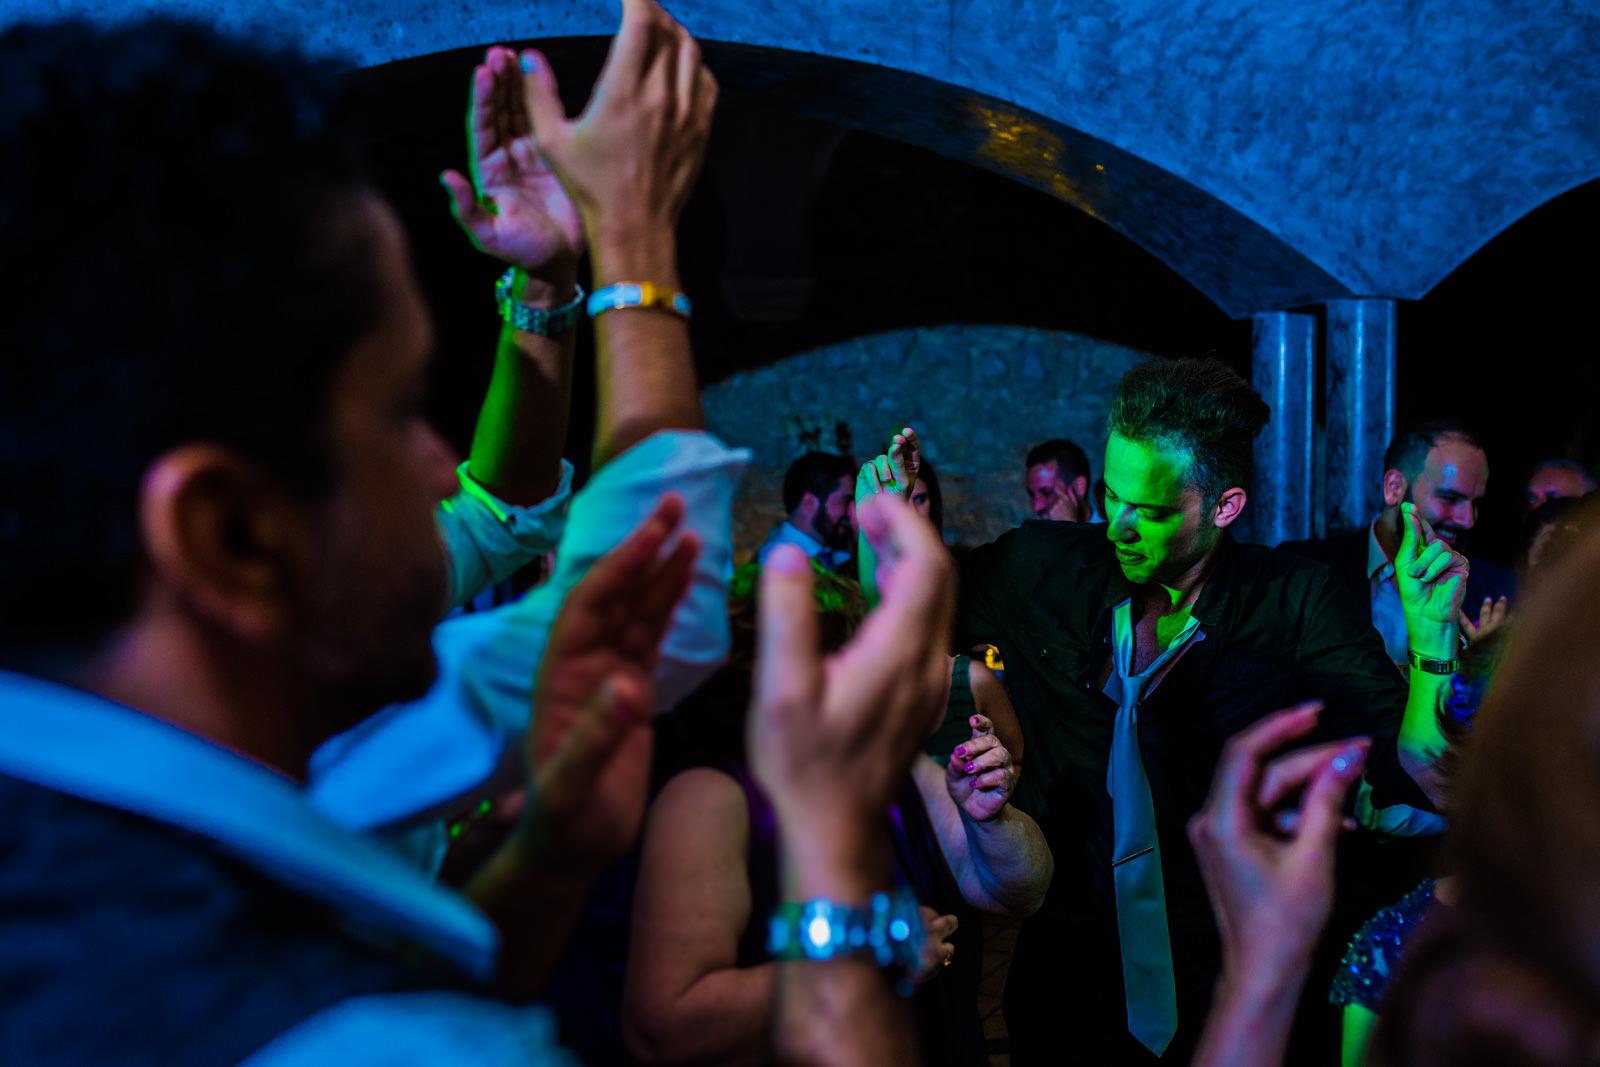 Almirall-Font-sitges-marbella-engagement-Rafael-Torres-fotografo-bodas-sevilla-madrid-barcelona-wedding-photographer--85.jpg